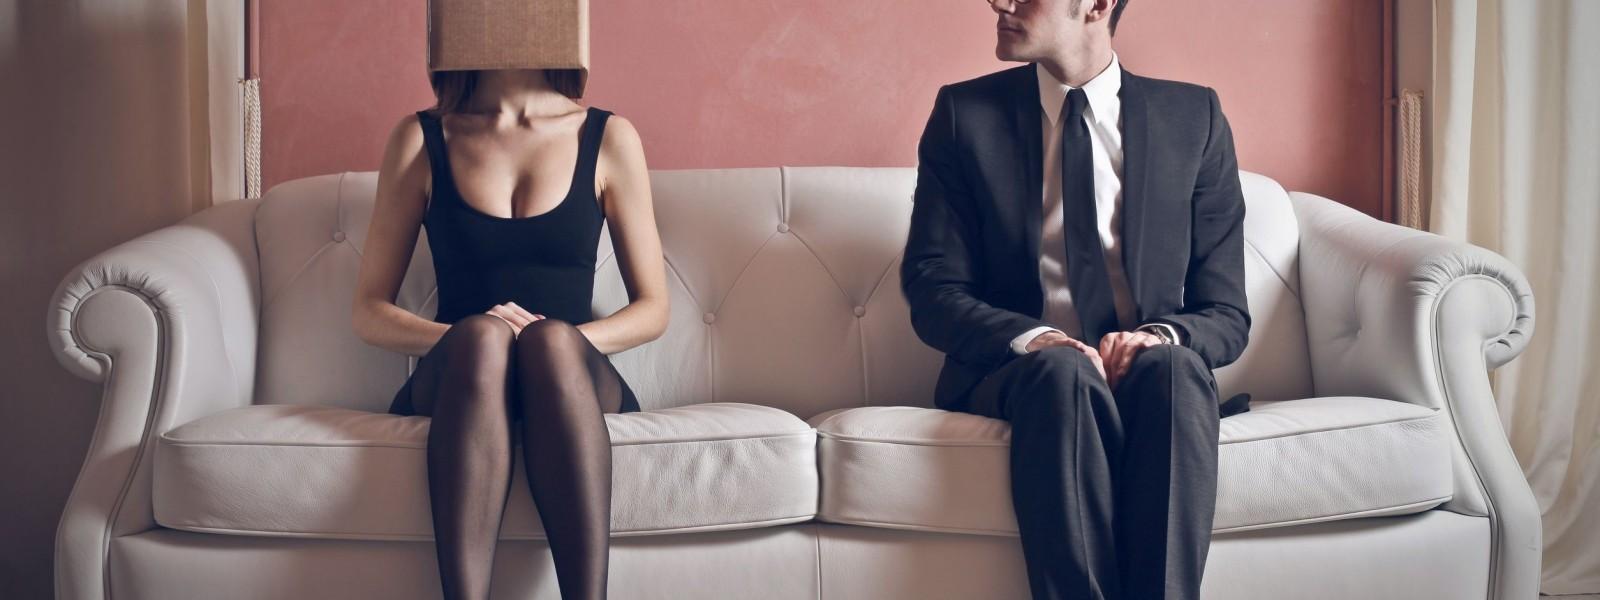 sofa couple head in box